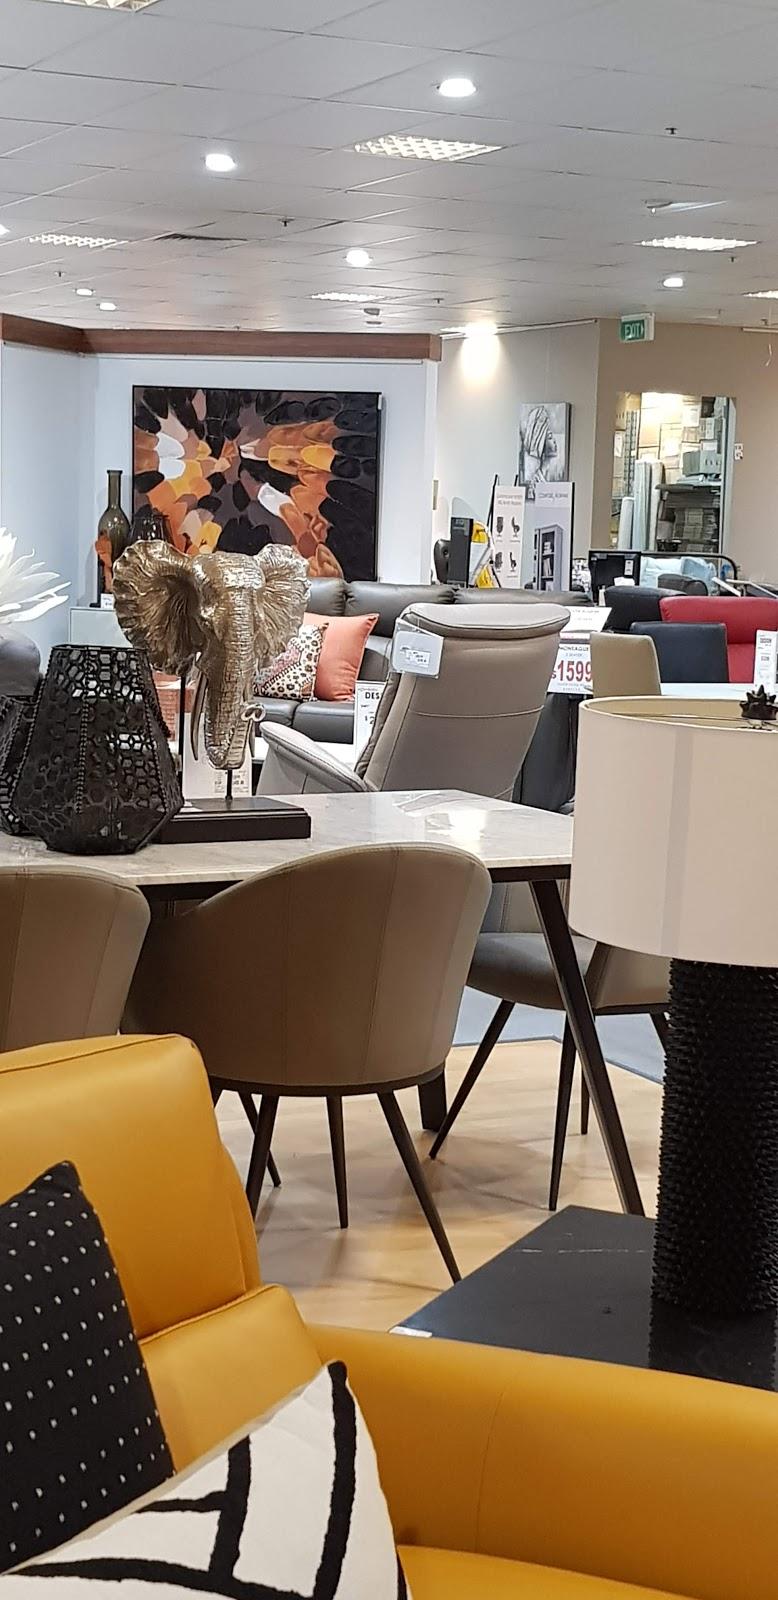 The Grove Homemaker Centre   shopping mall   2-18 Orange Grove Rd, Liverpool NSW 2170, Australia   0298213588 OR +61 2 9821 3588